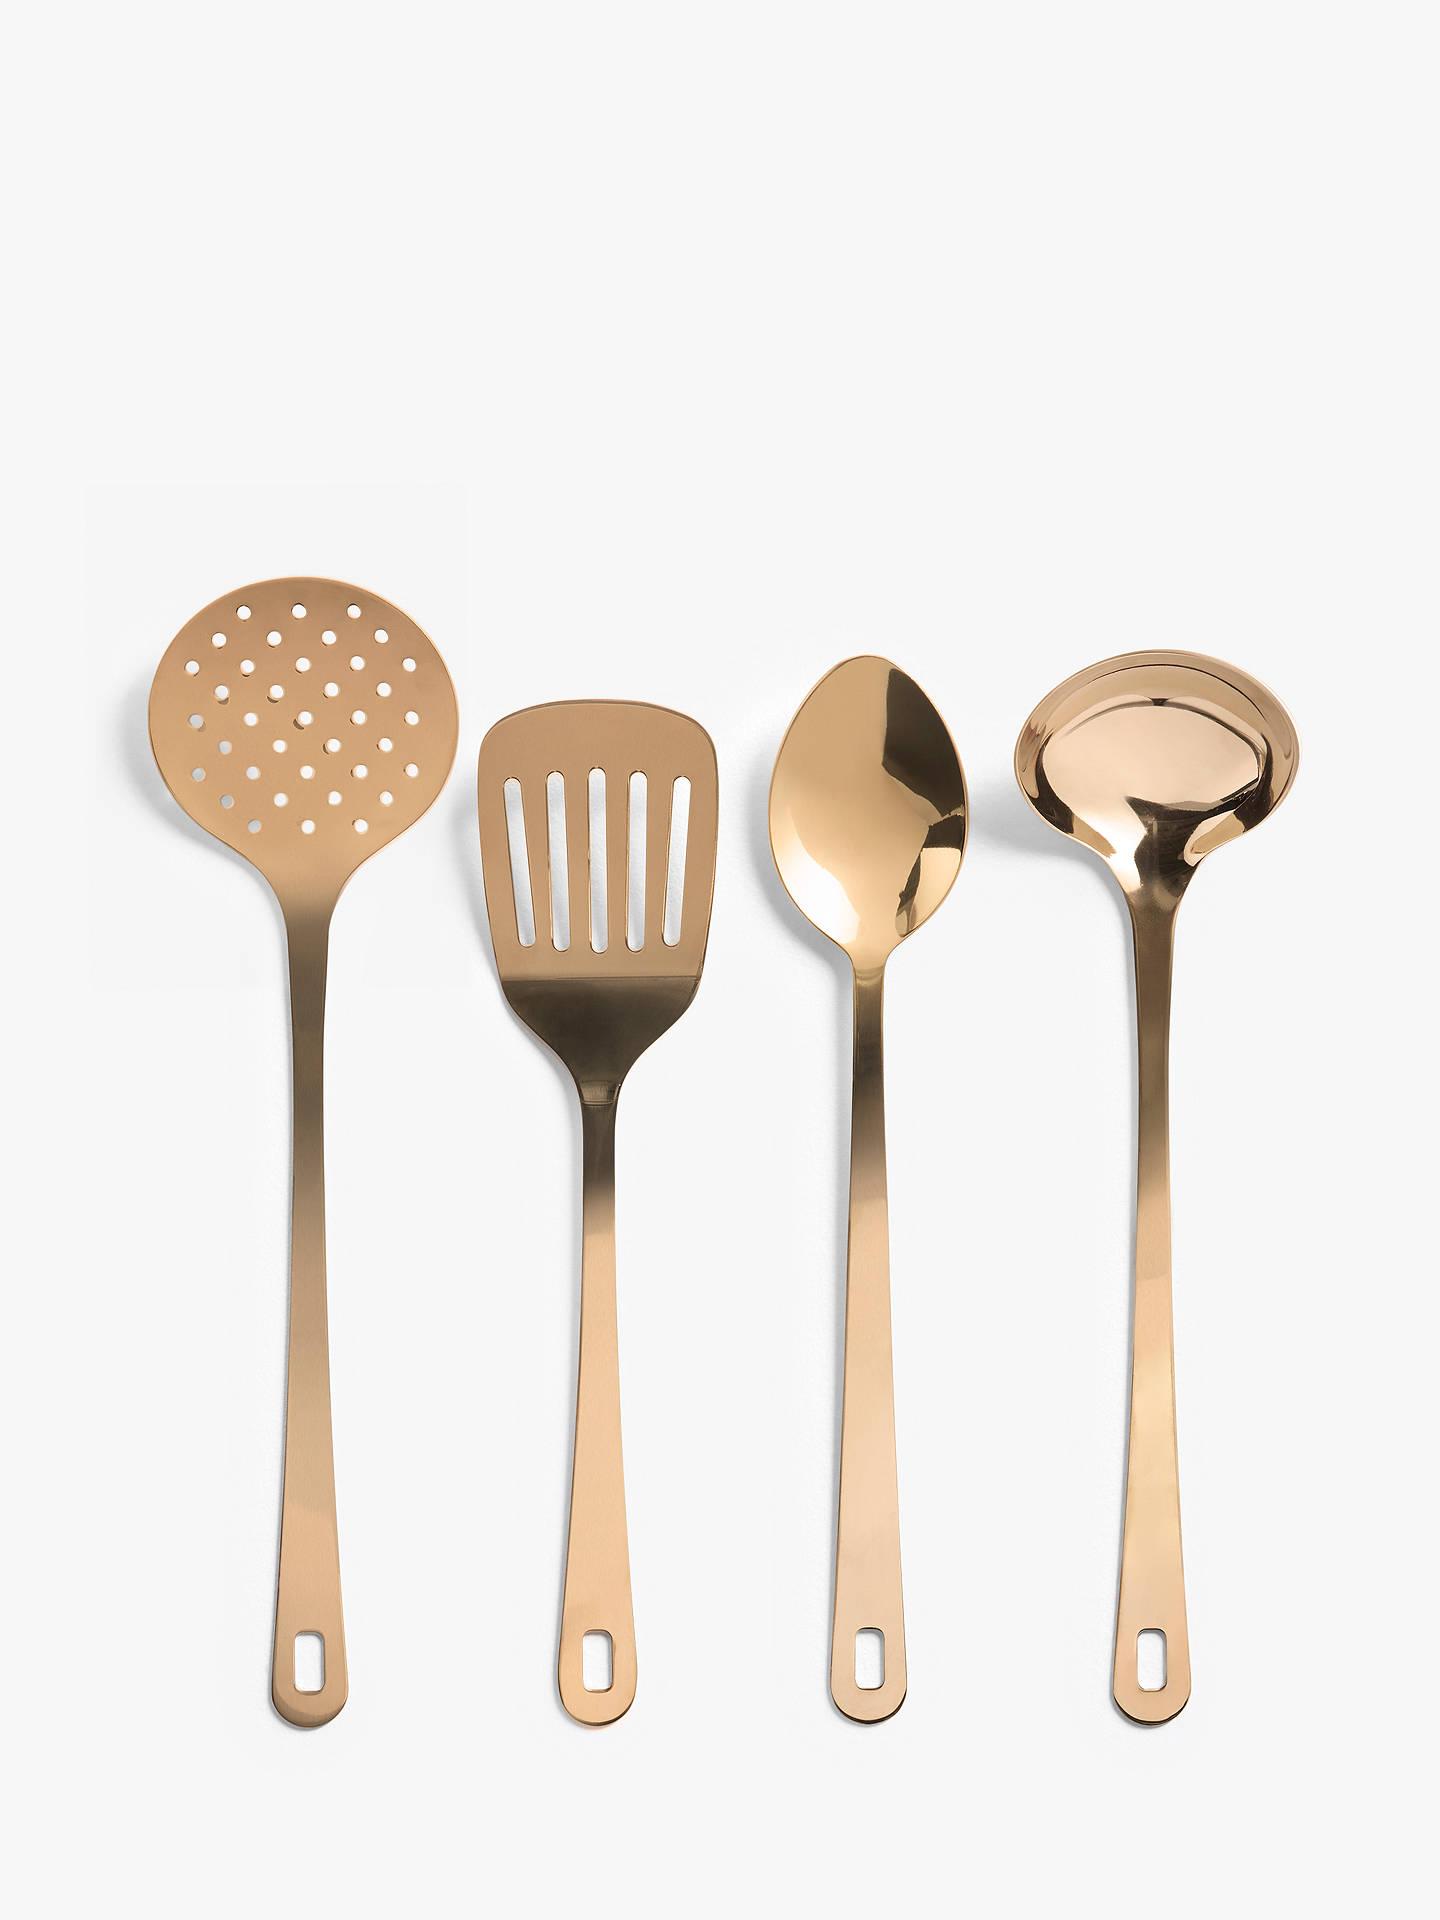 John Lewis & Partners Stainless Steel Kitchen Utensils, Set of 8, Rose Gold